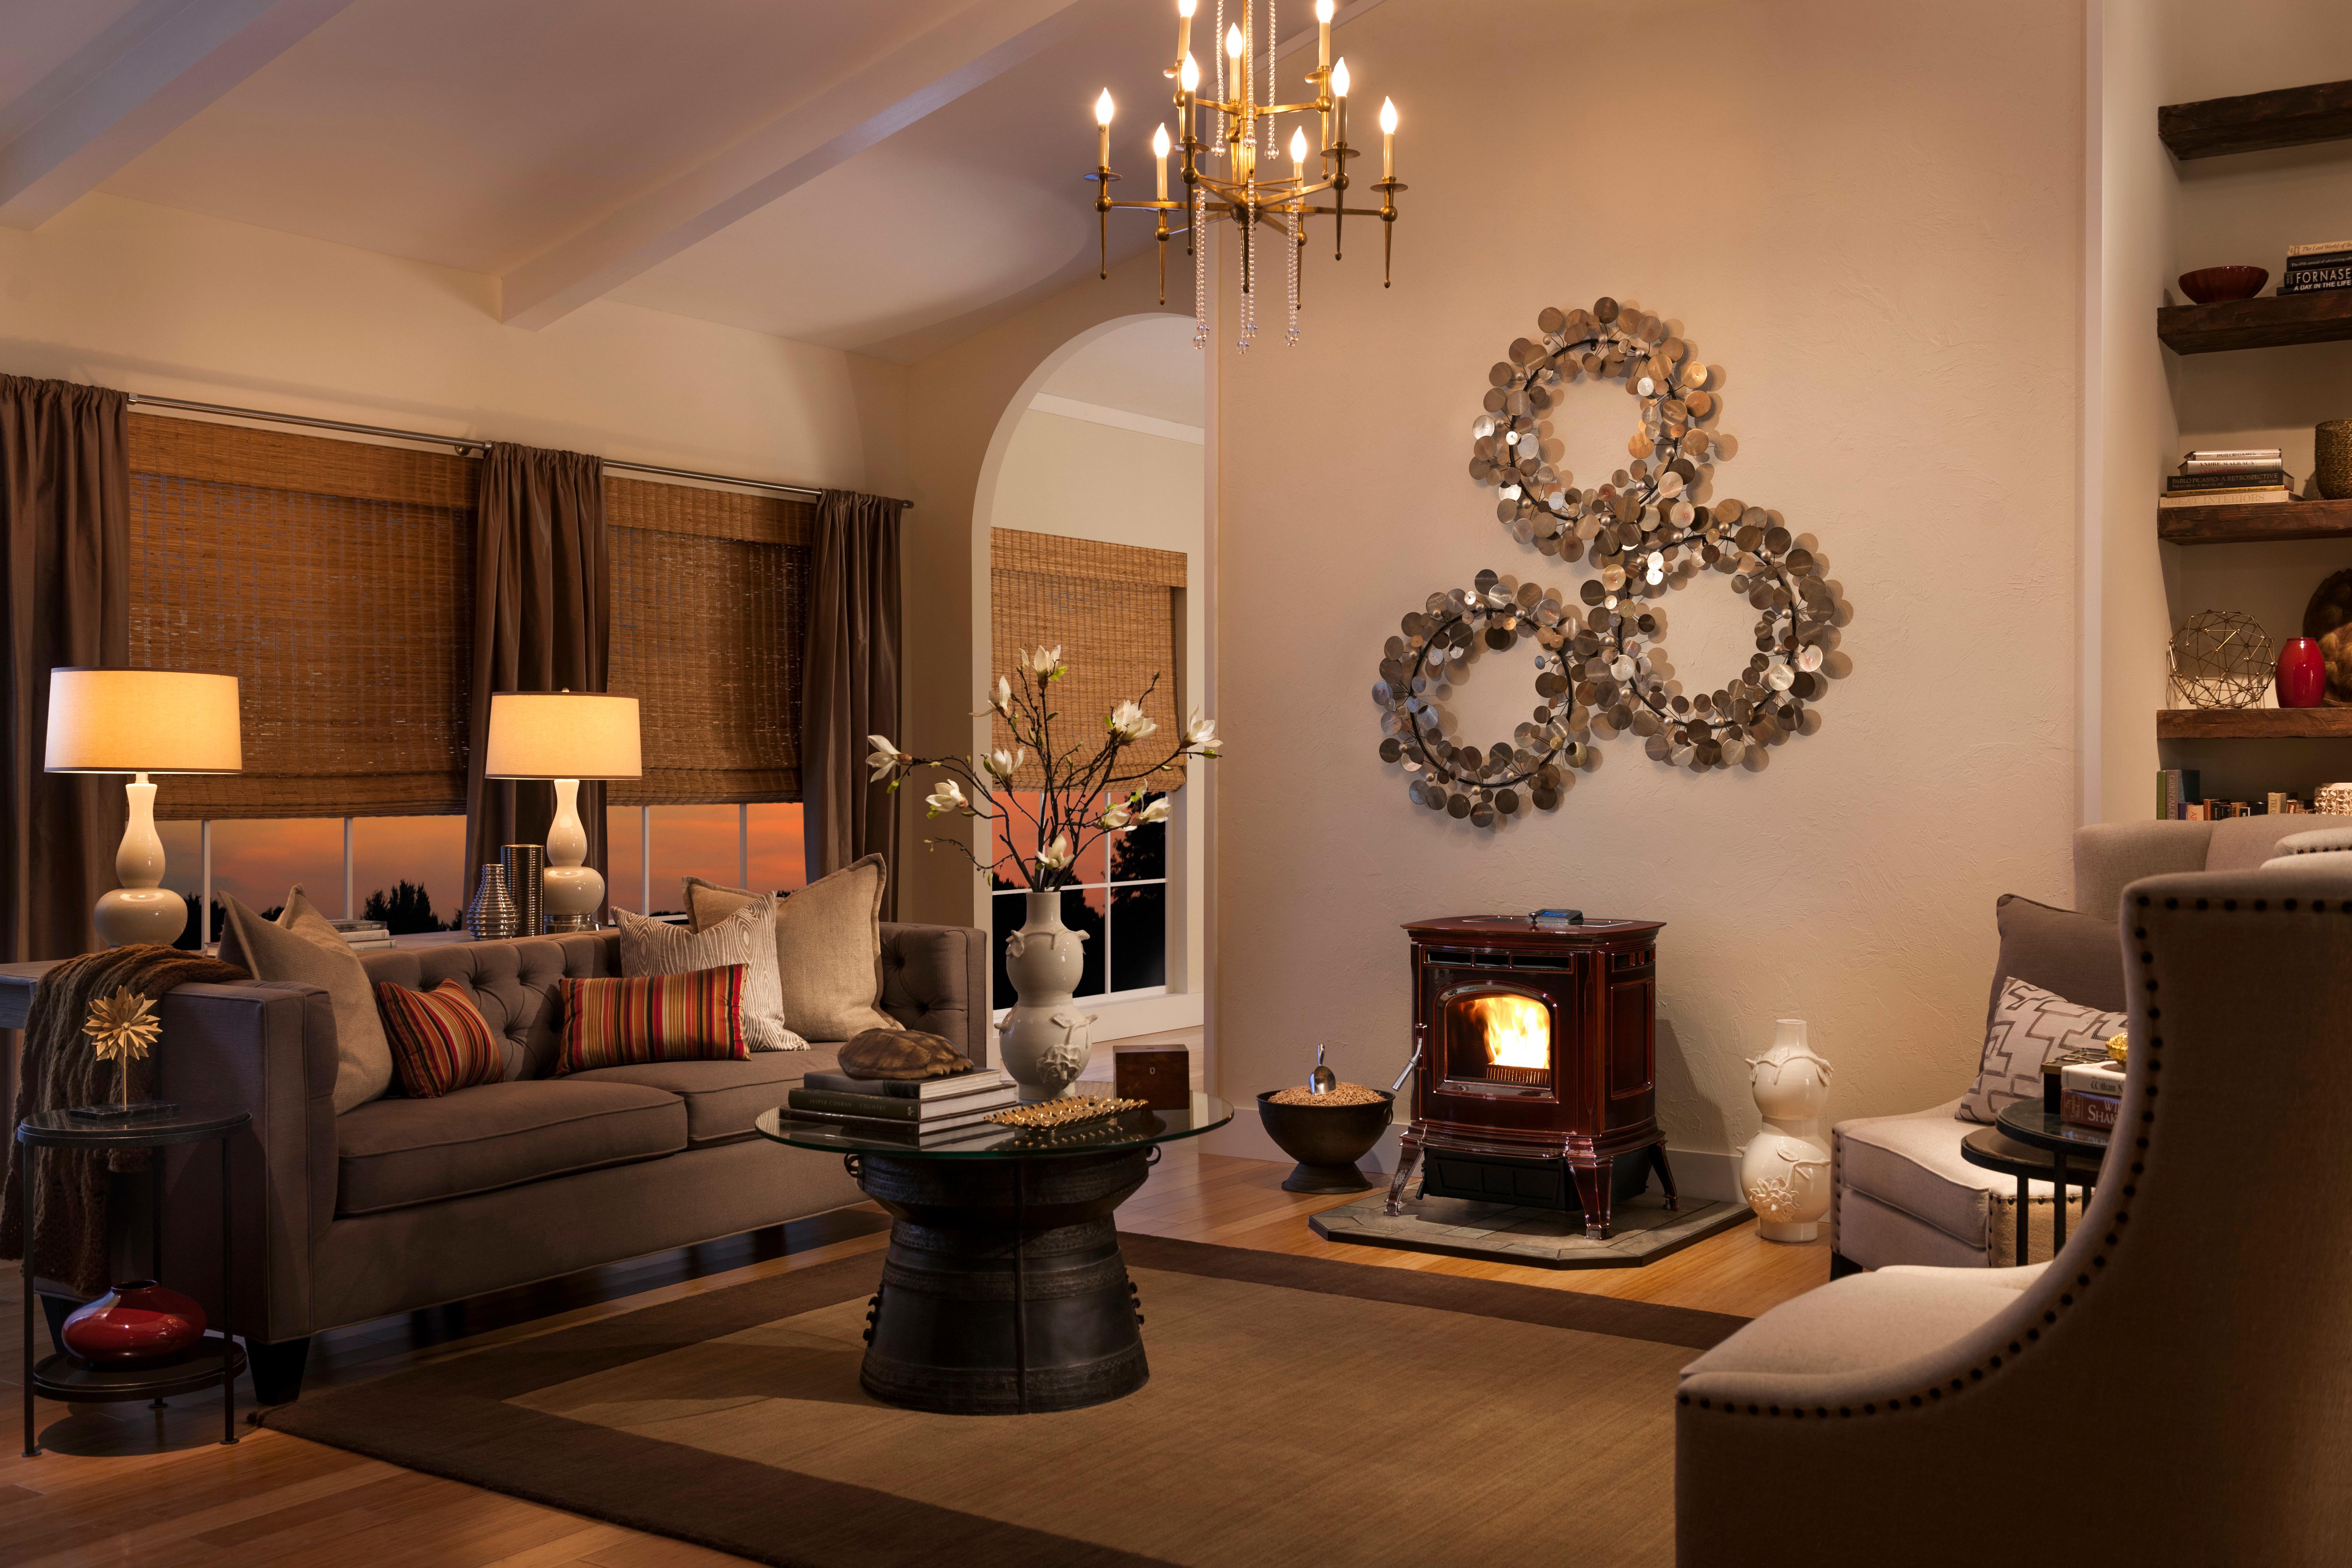 Fireside Hearth & Home image 2